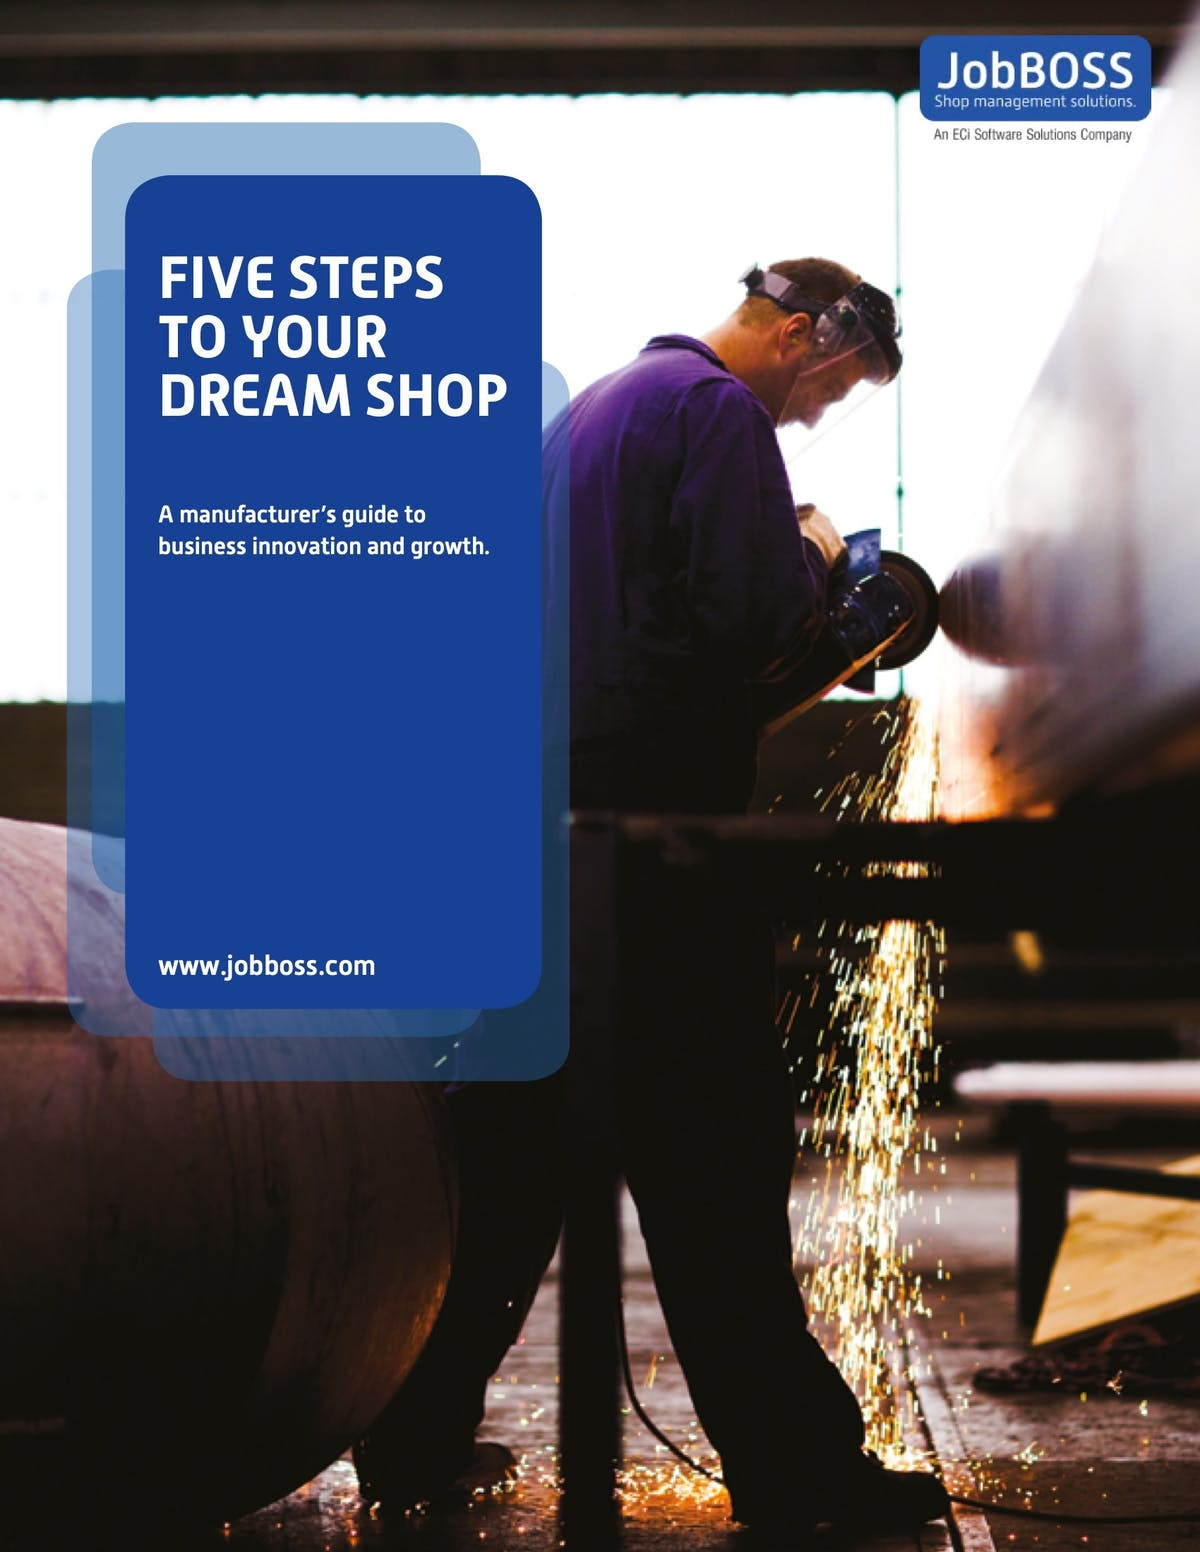 JobBOSS  Shop Management Solution White Paper - Five Steps To Your Dream Shop